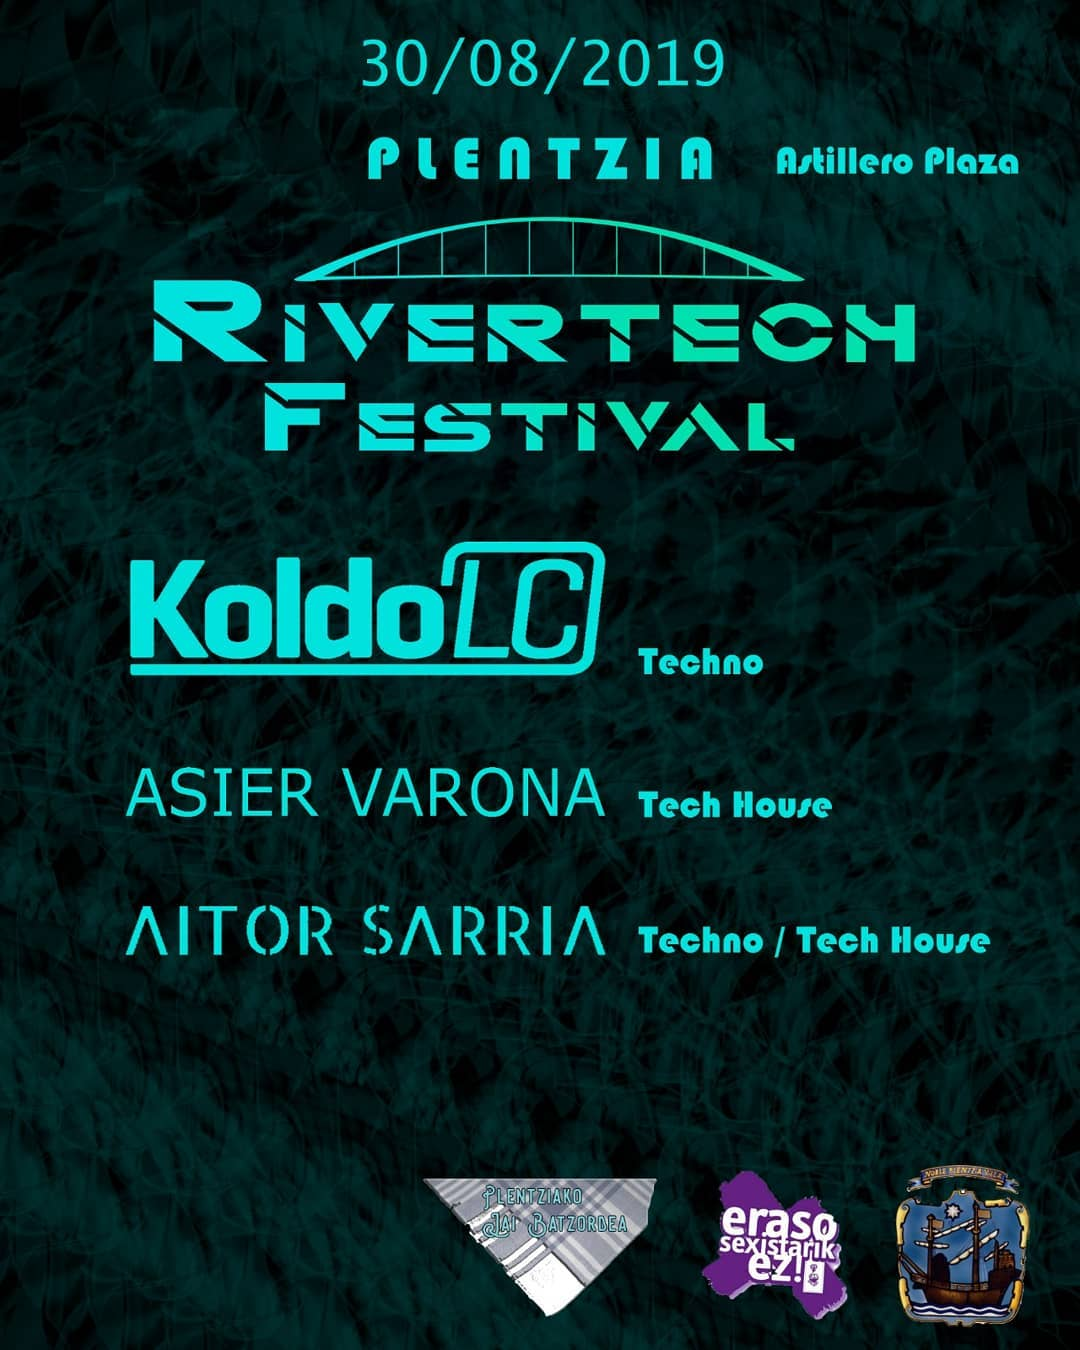 Imagen representativa de Rivertech Festival